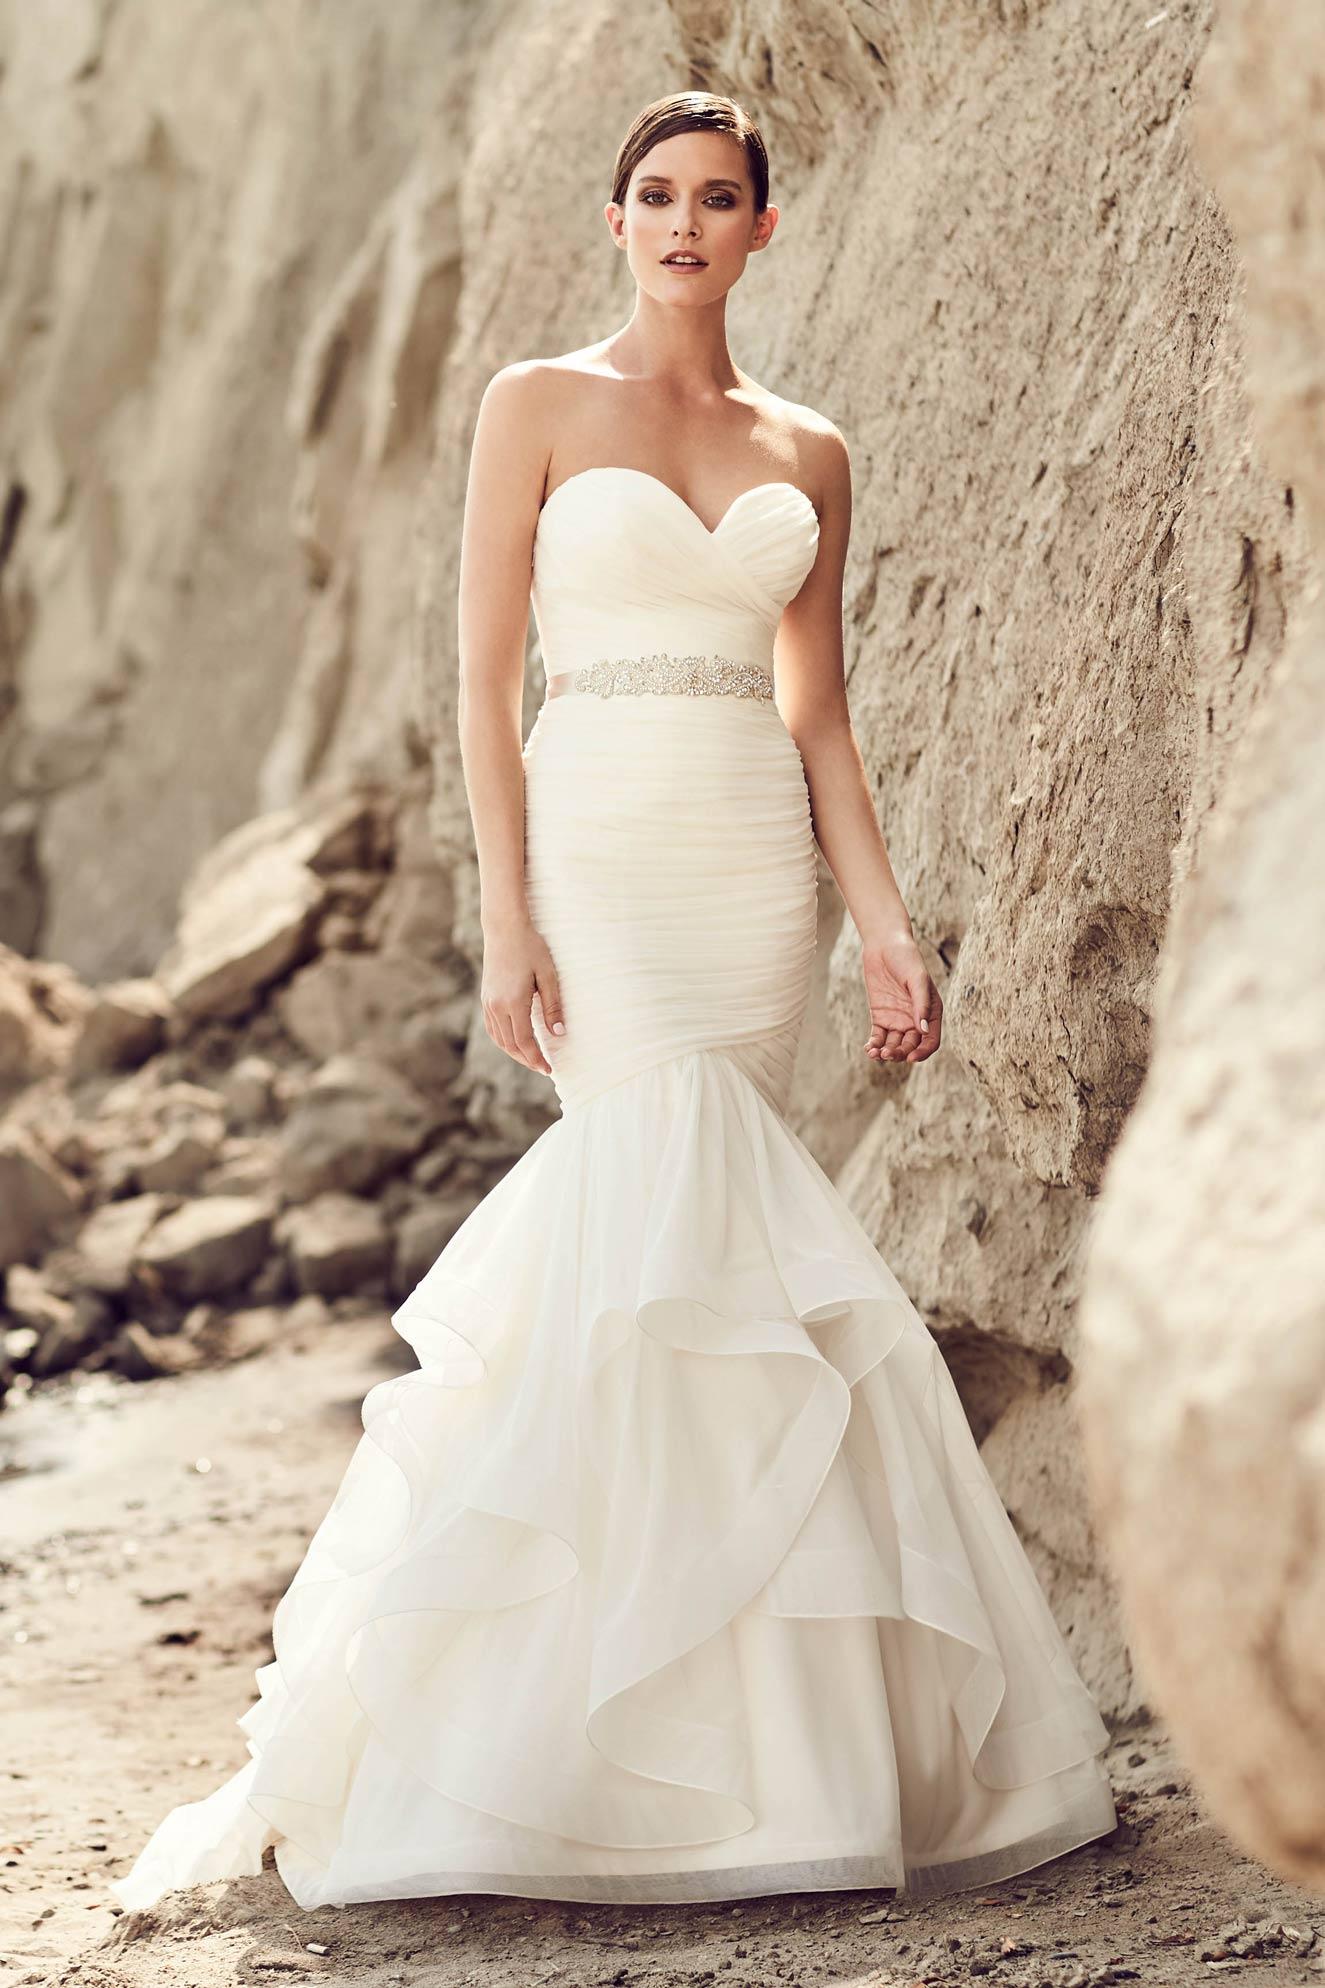 Mb2111 Mesh Tulle Wedding Dress: Lulus Beaded Bodice Wedding Dress At Websimilar.org